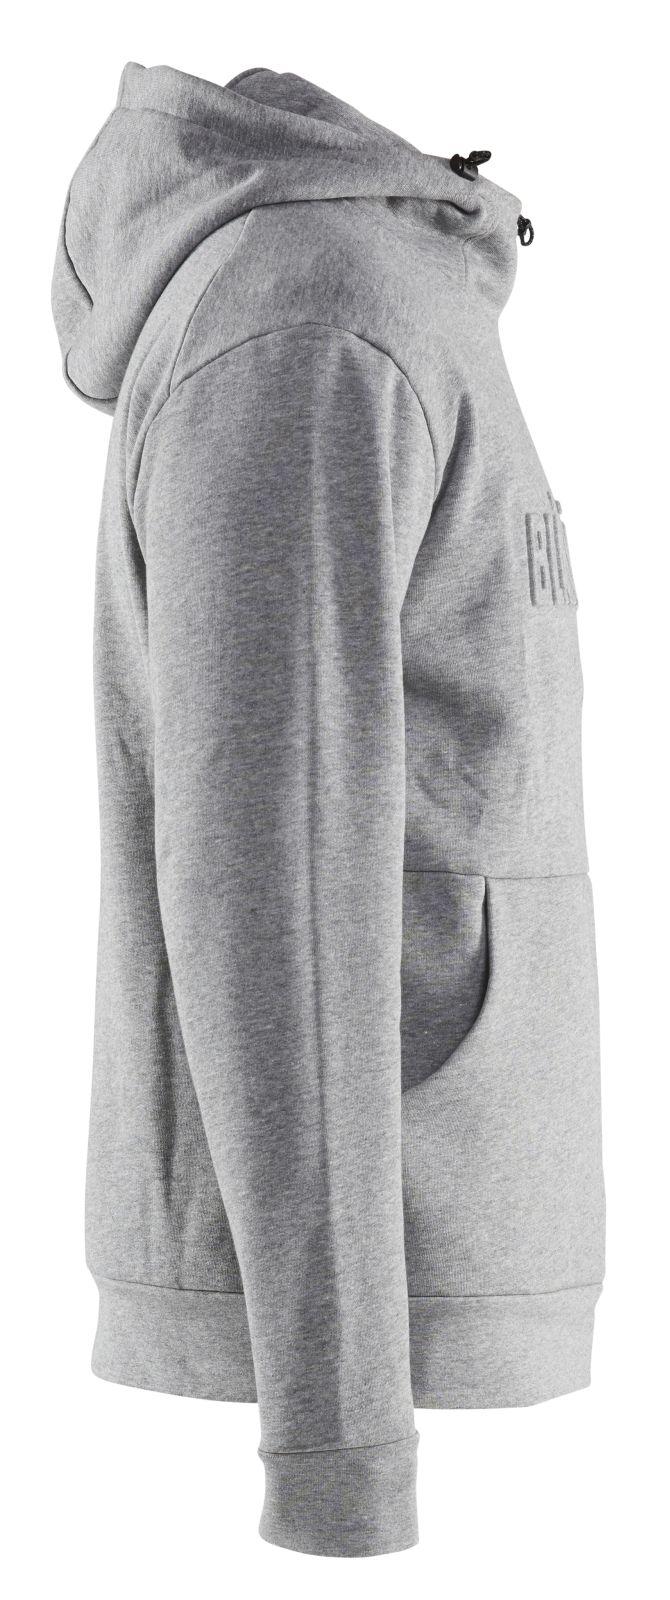 Blaklader sweatershirts 35301157 grijs melee(9000)